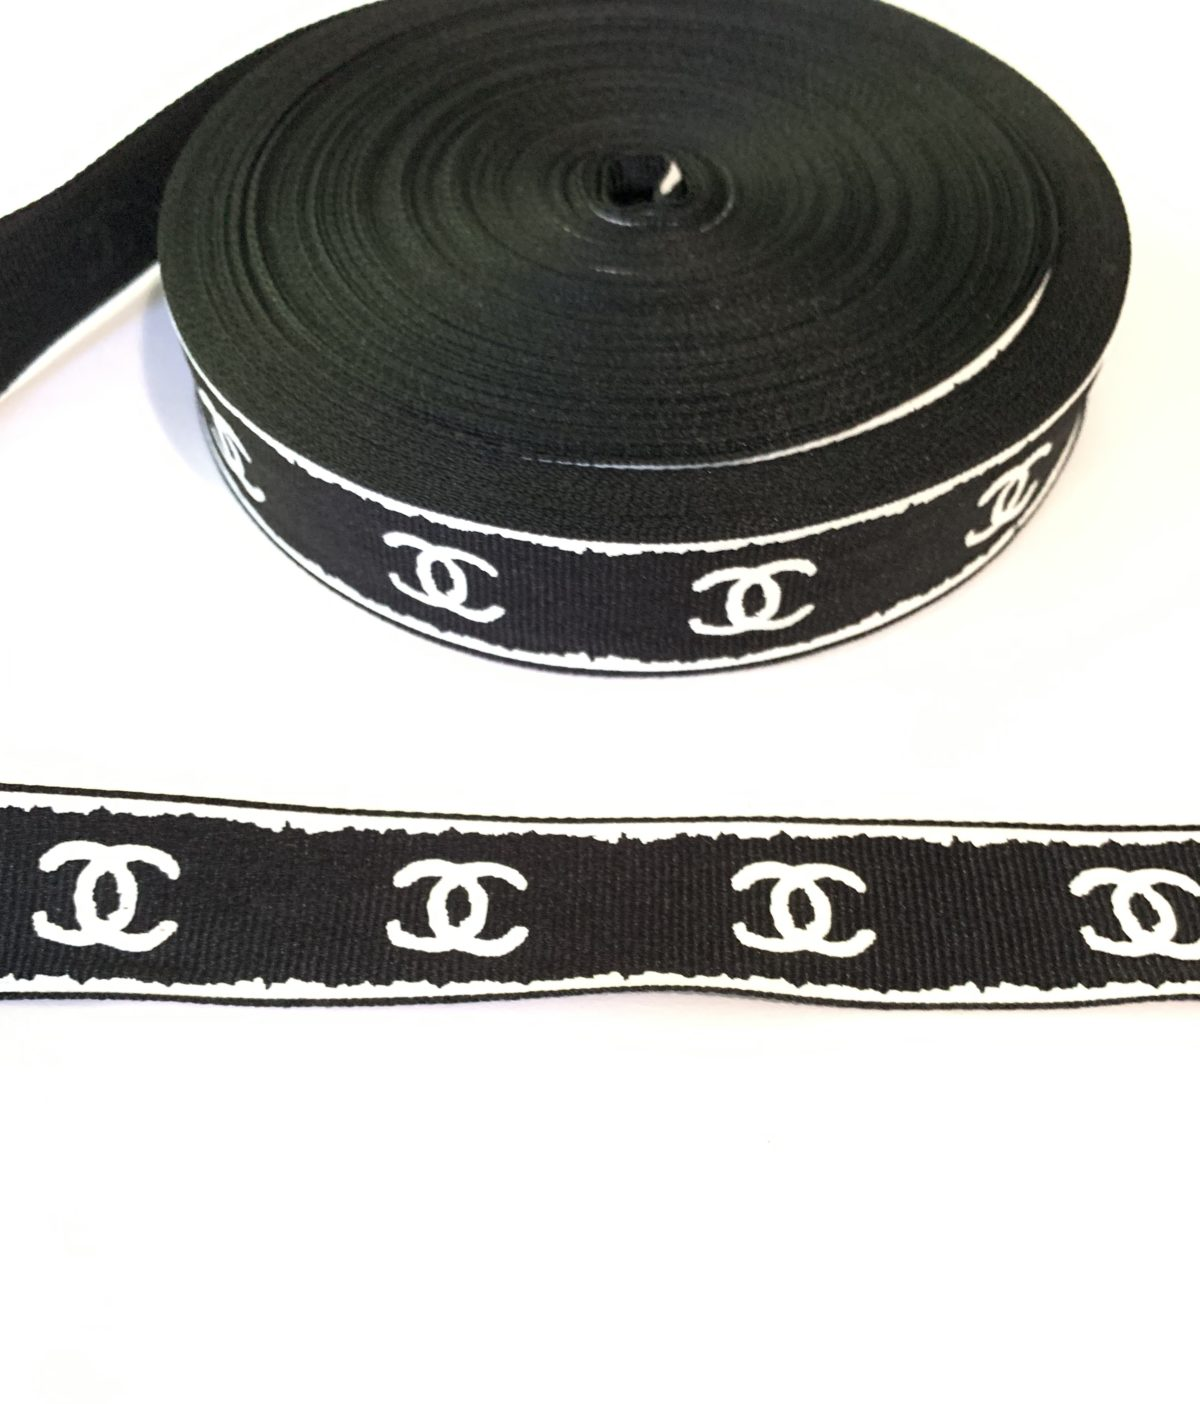 "Designer Inspired Ribbon 1"" (3 Yards) 1"